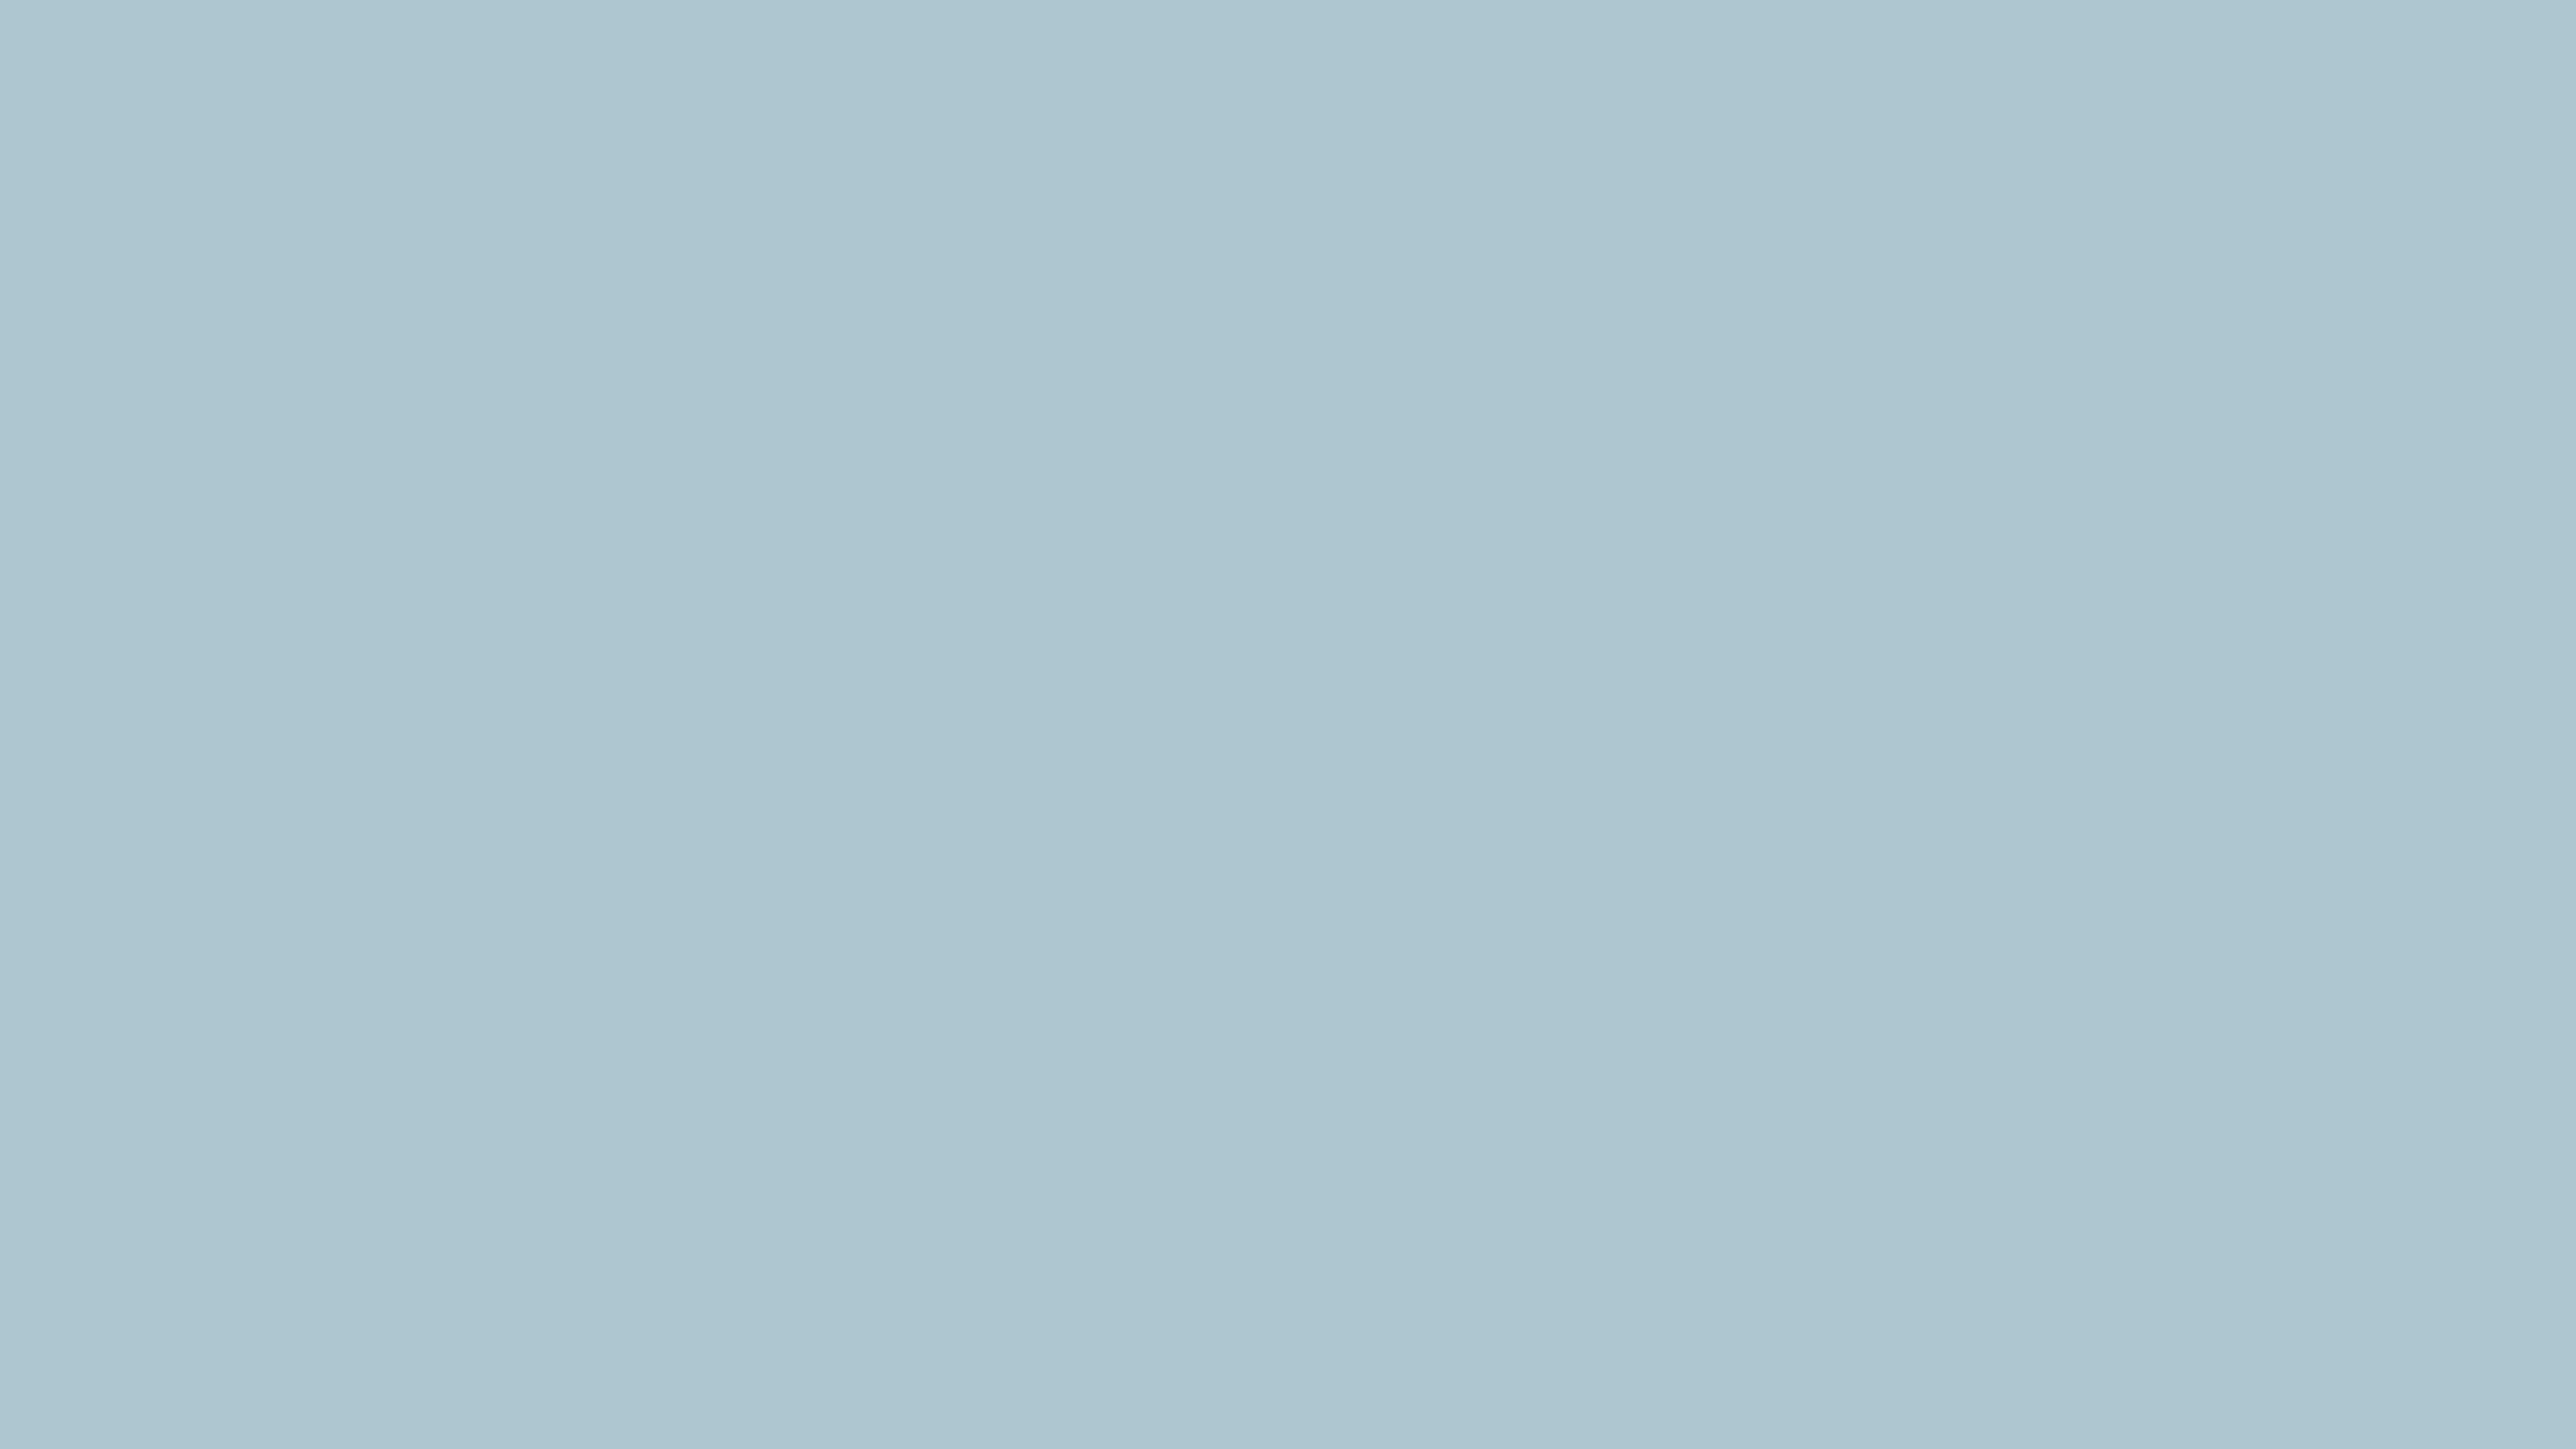 3840x2160 Pastel Blue Solid Color Background